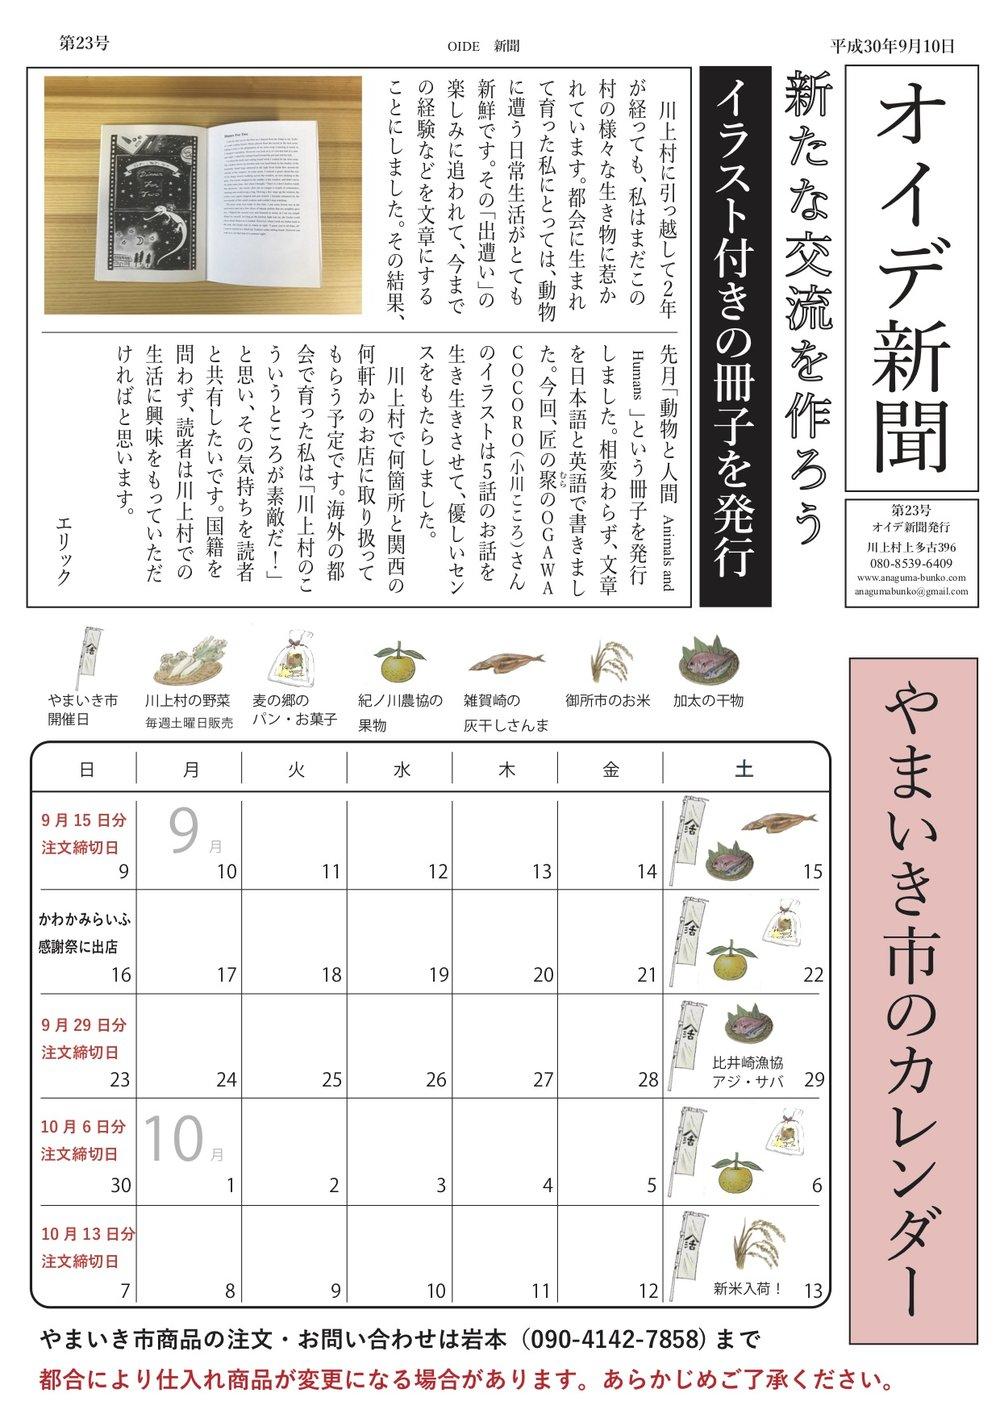 oide新聞30年9月号表.jpg